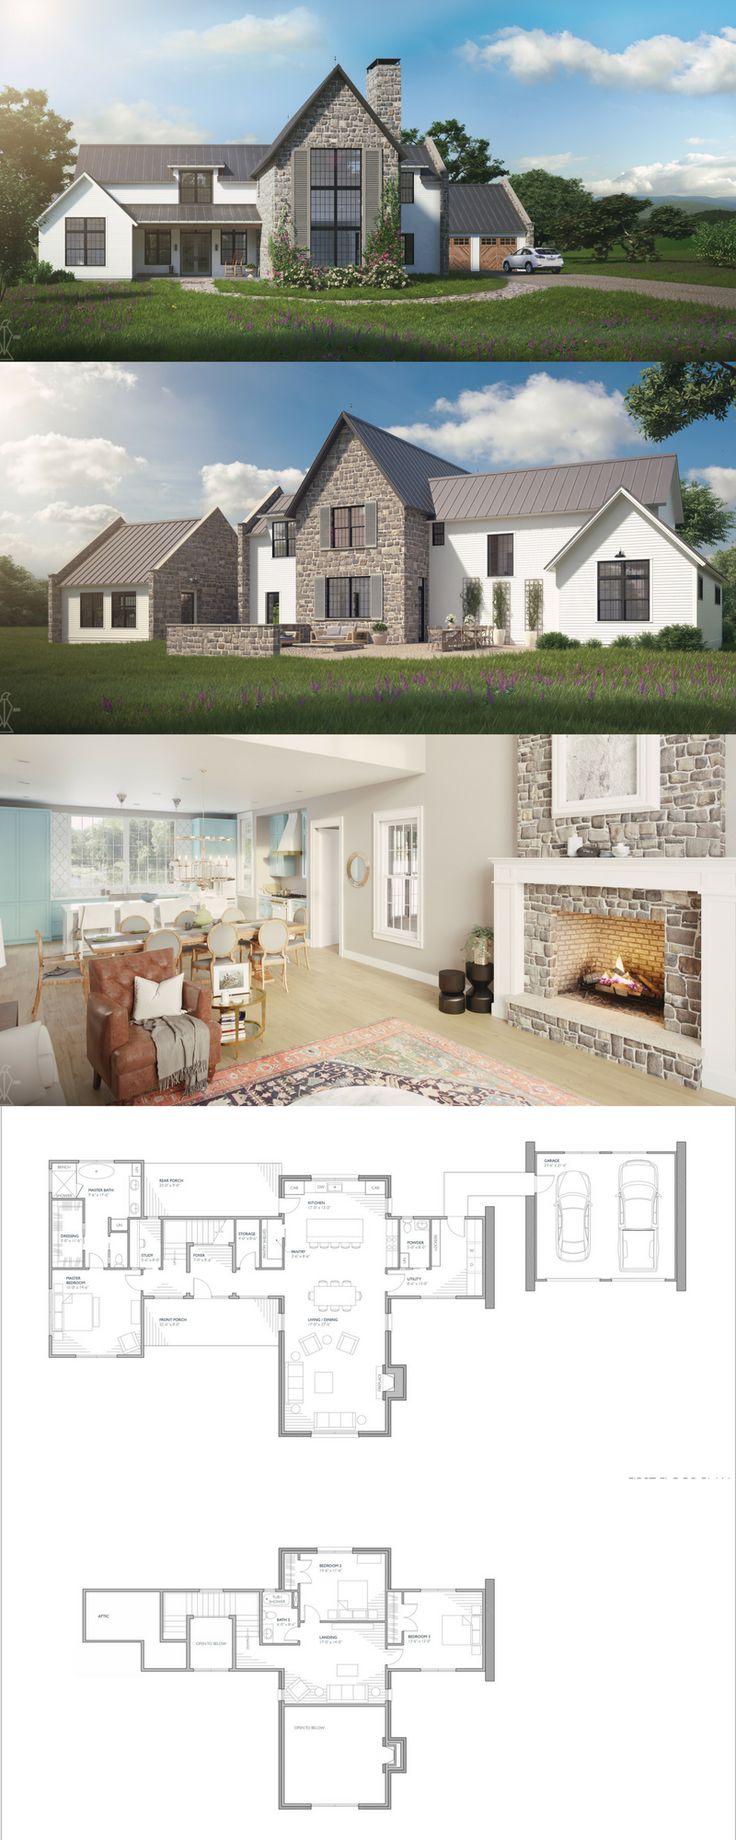 The Aubrac Plan! Maison Provincial European inspired Floor Plans. 3152 SF Designer House Plan. French Modern Farmhouse. Countryside homes. Detached 2 …